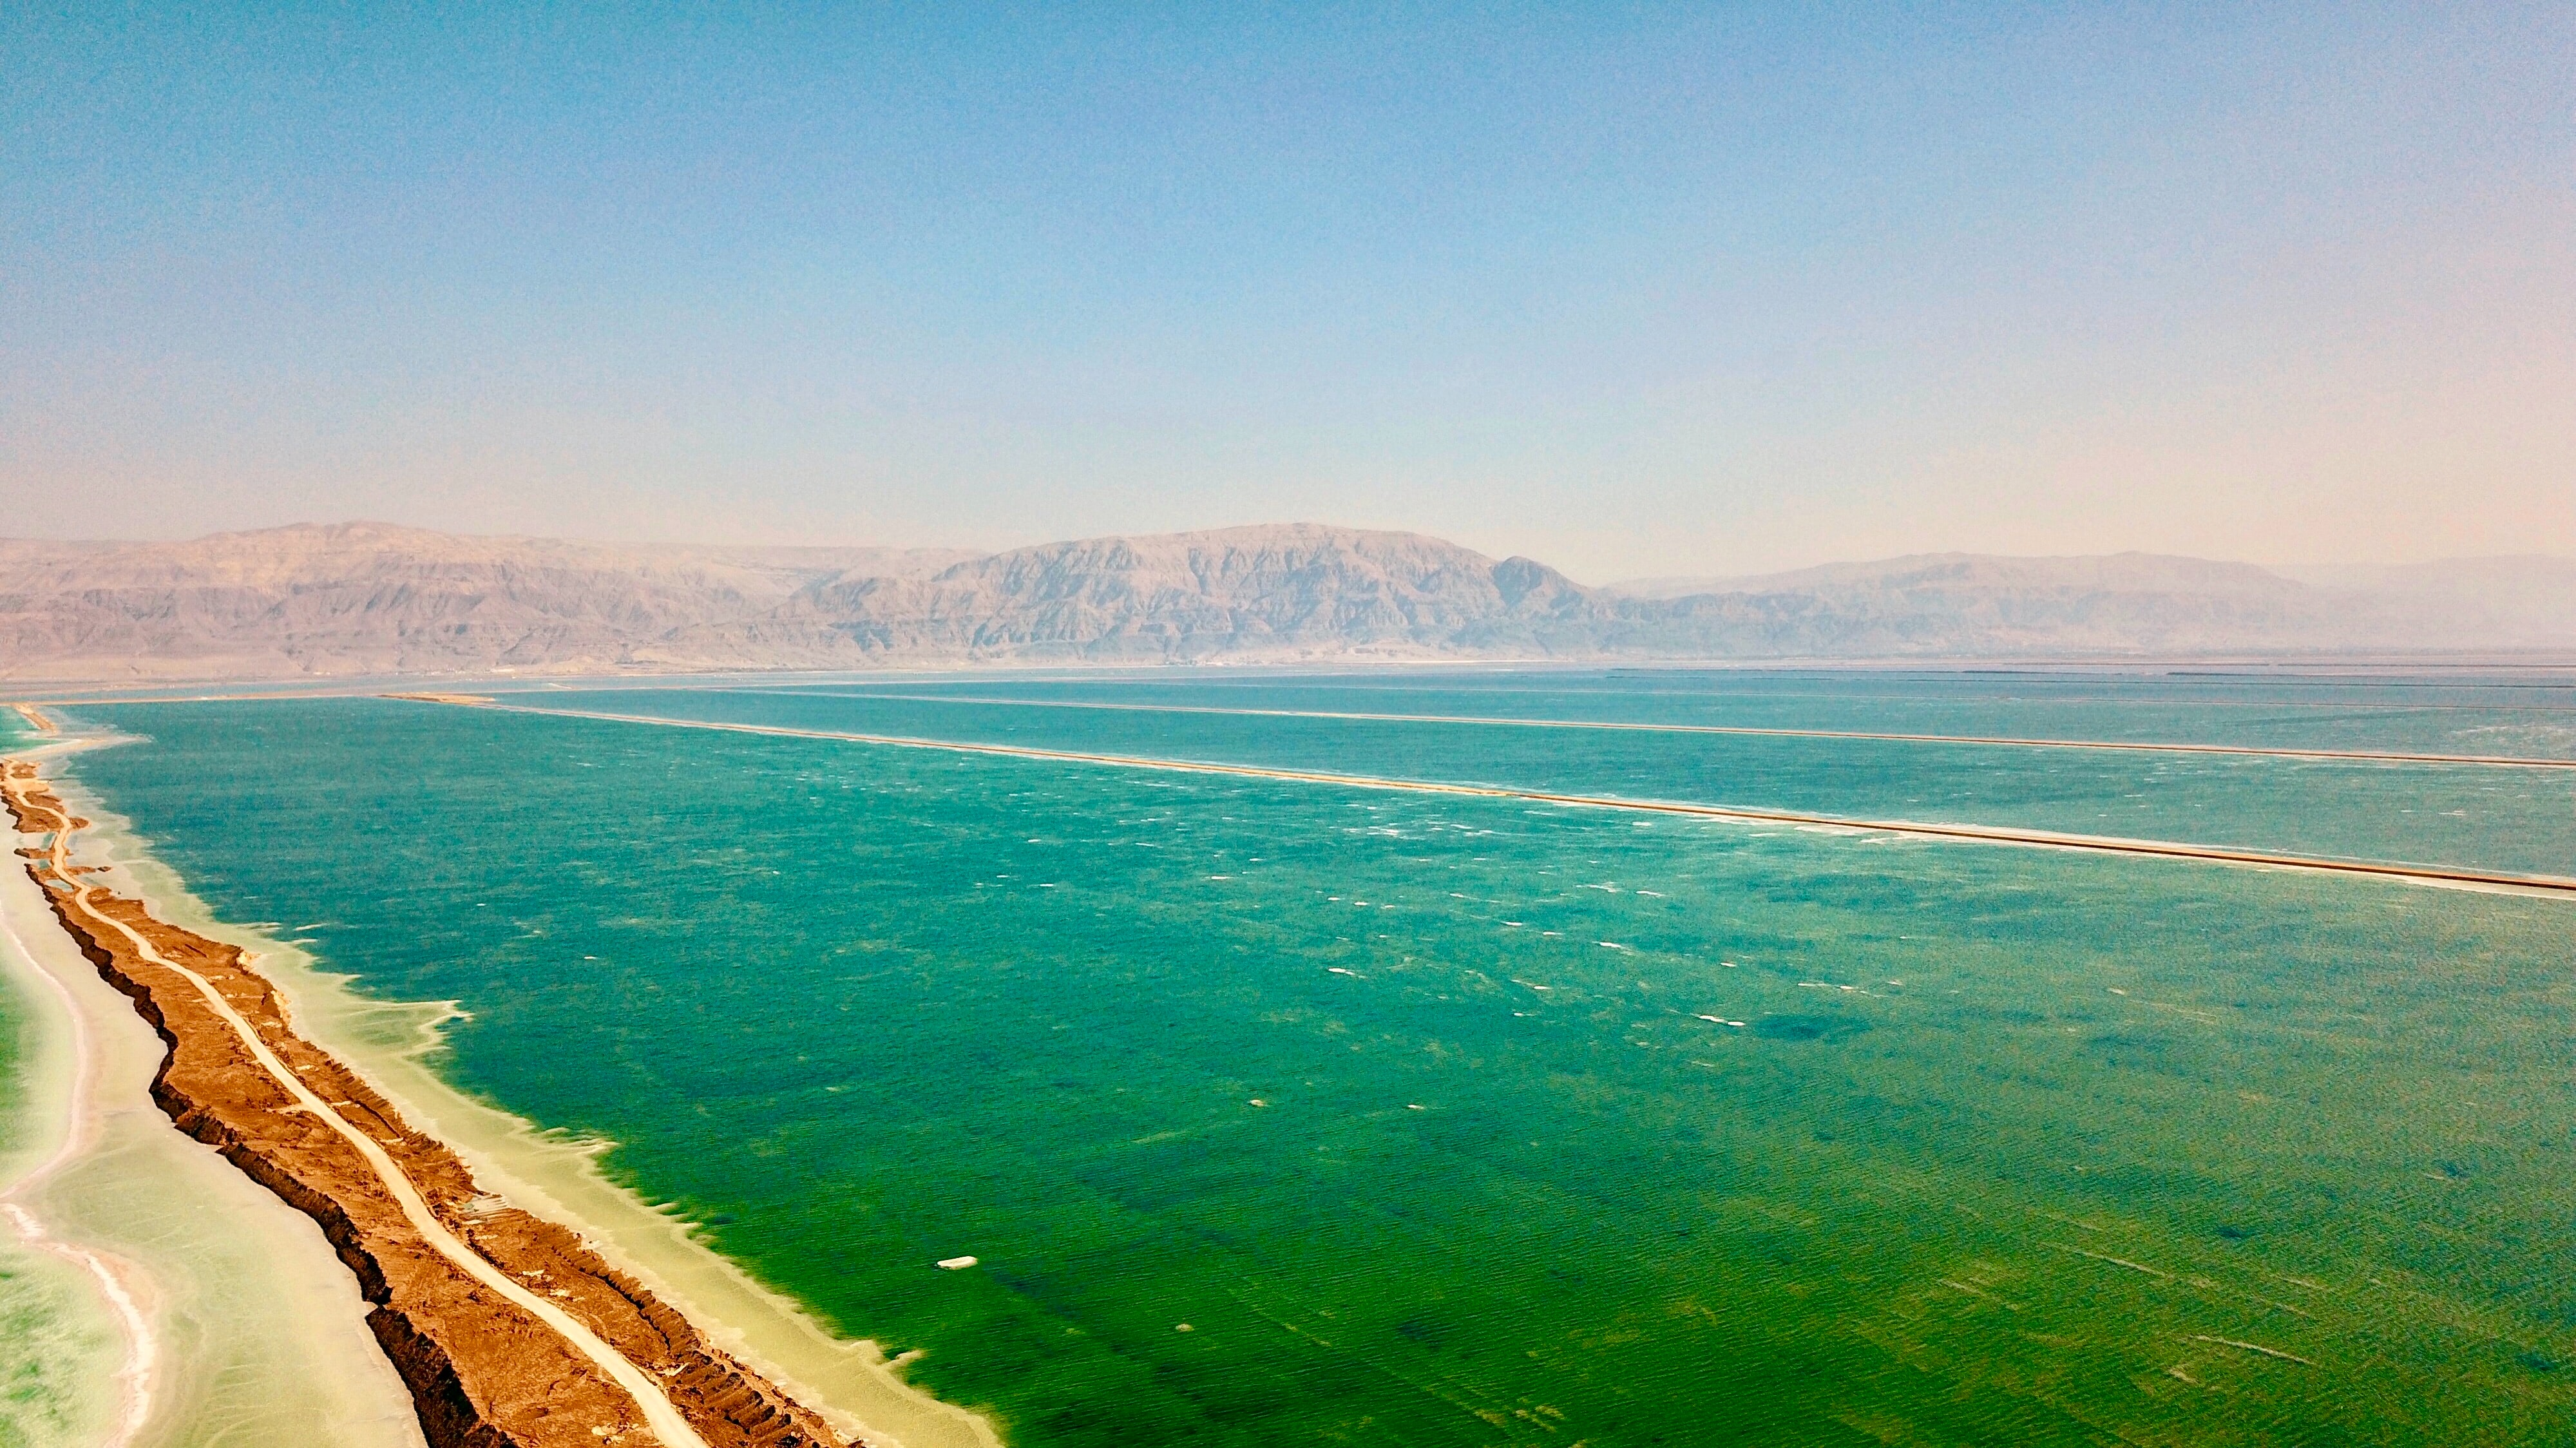 Dead Sea Photo by Eli Levit